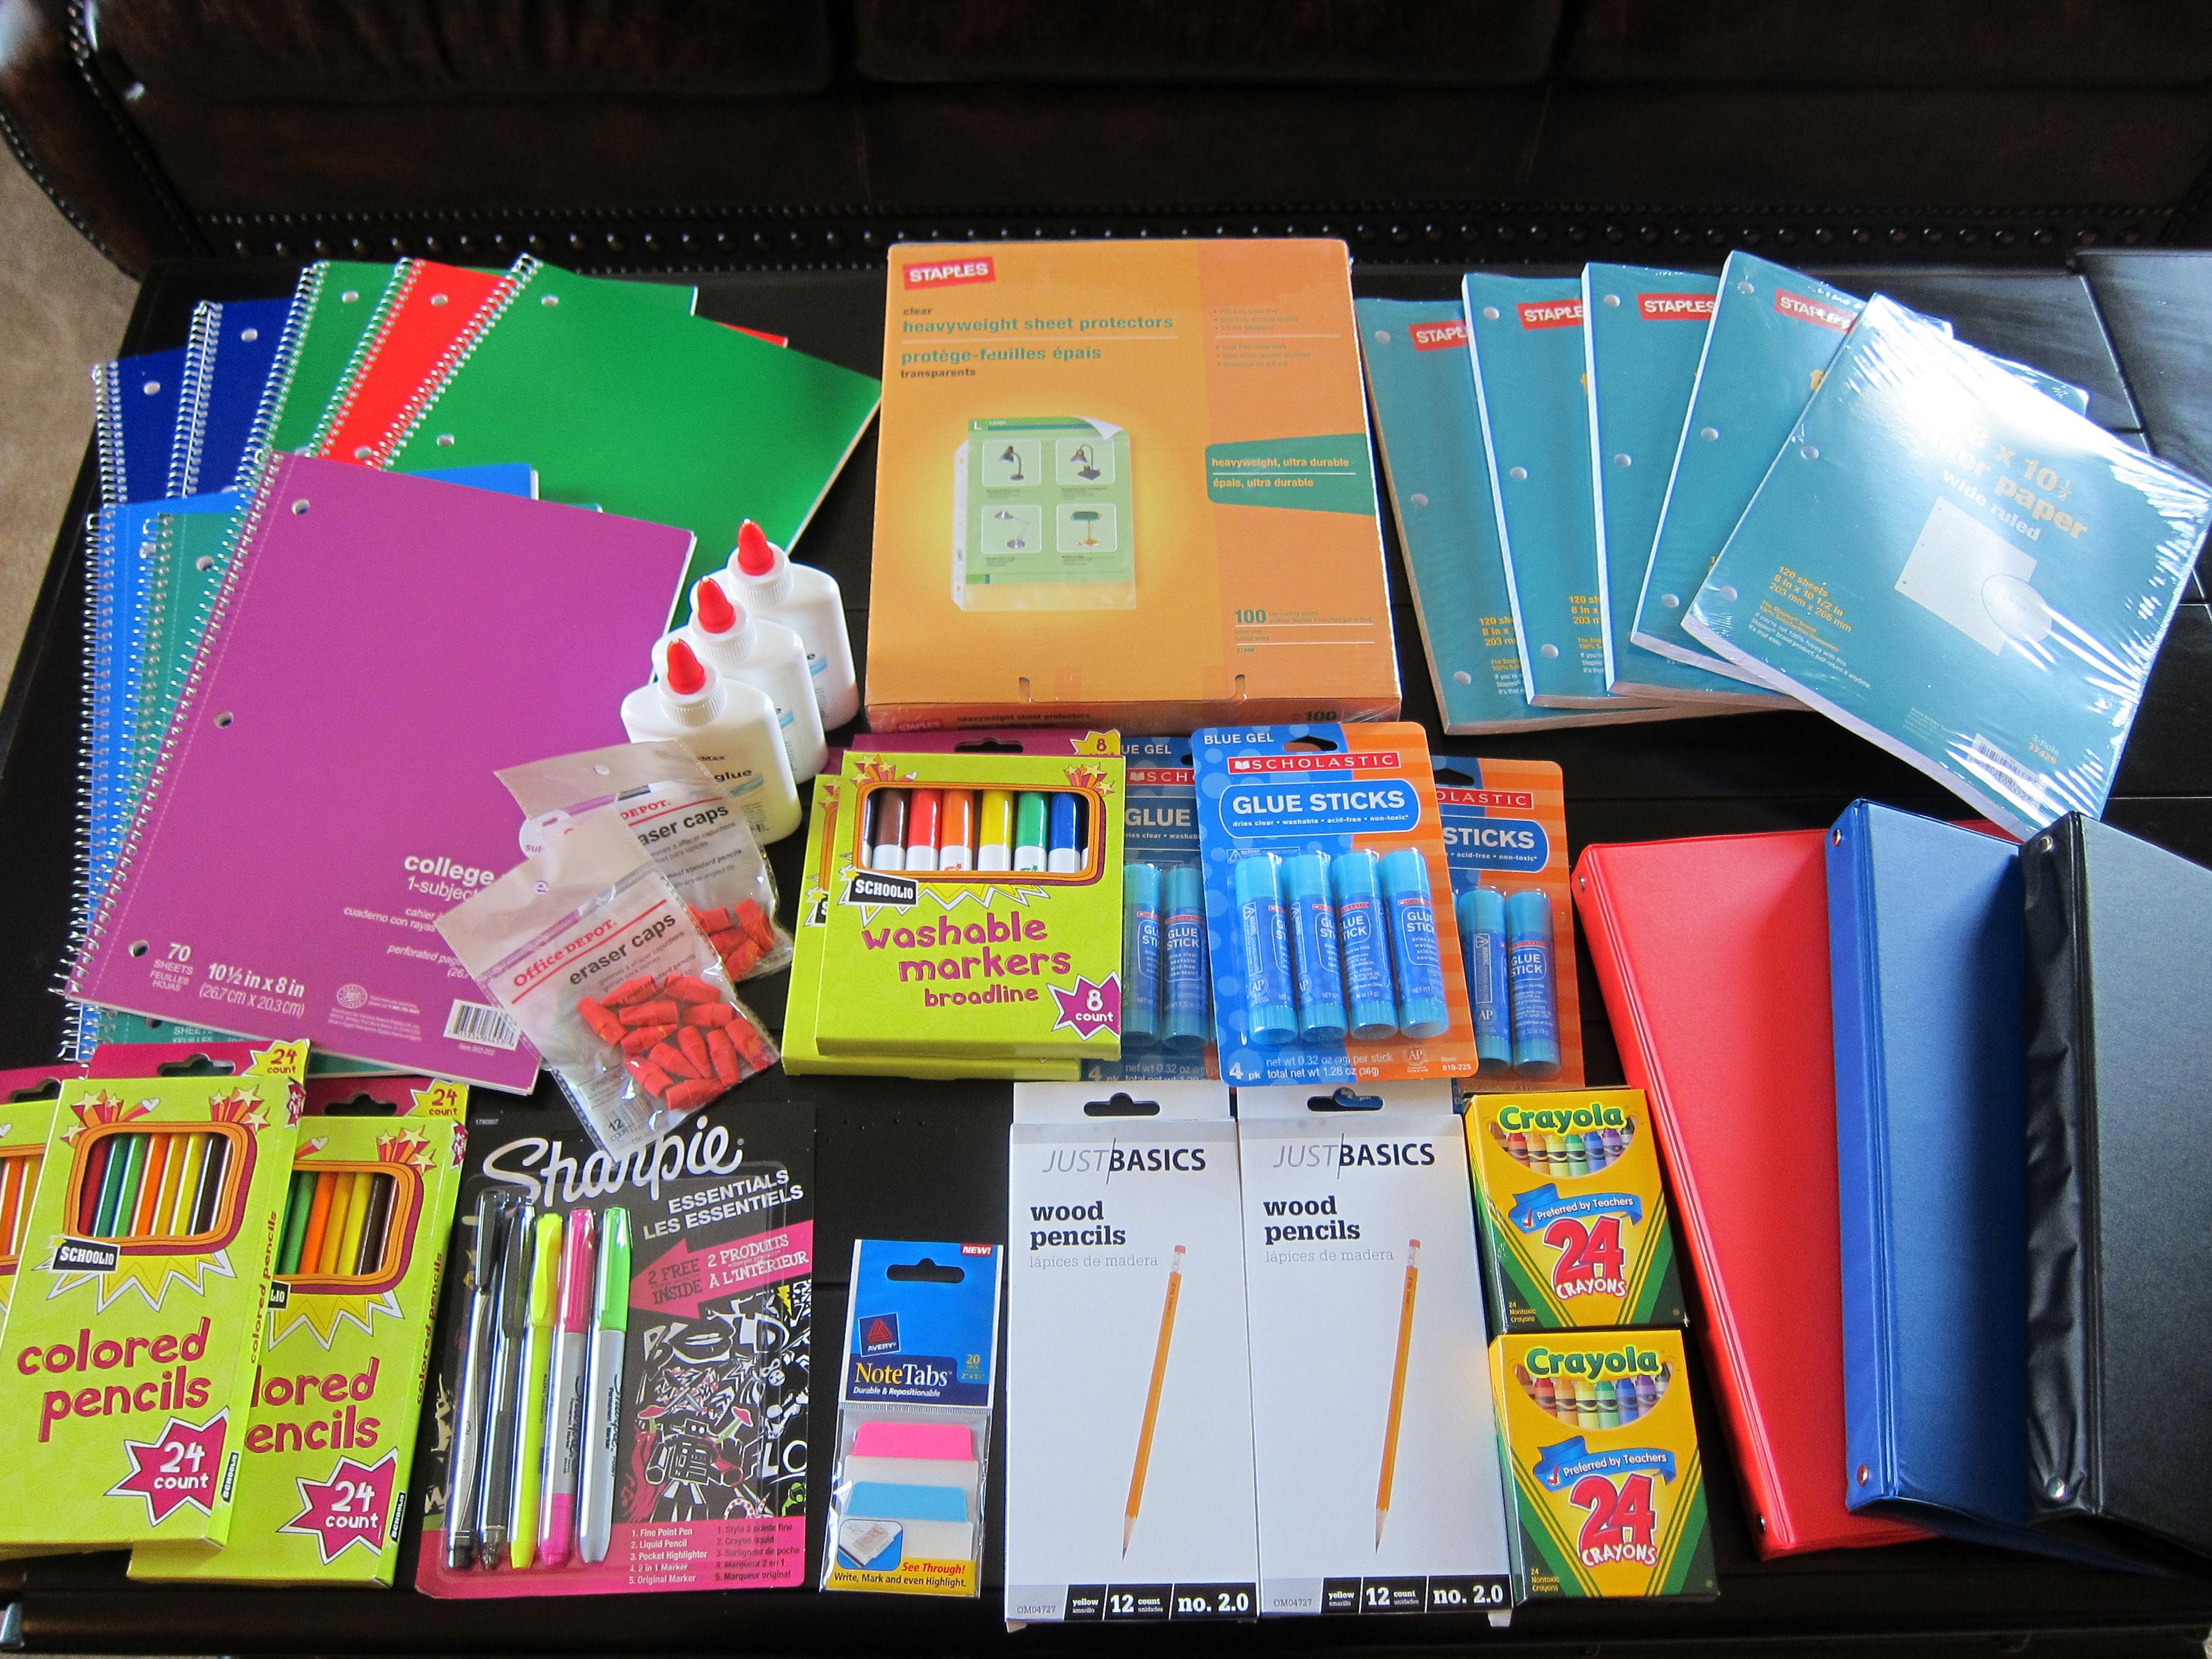 megan mondays a day of miracles school supplies - Suplies